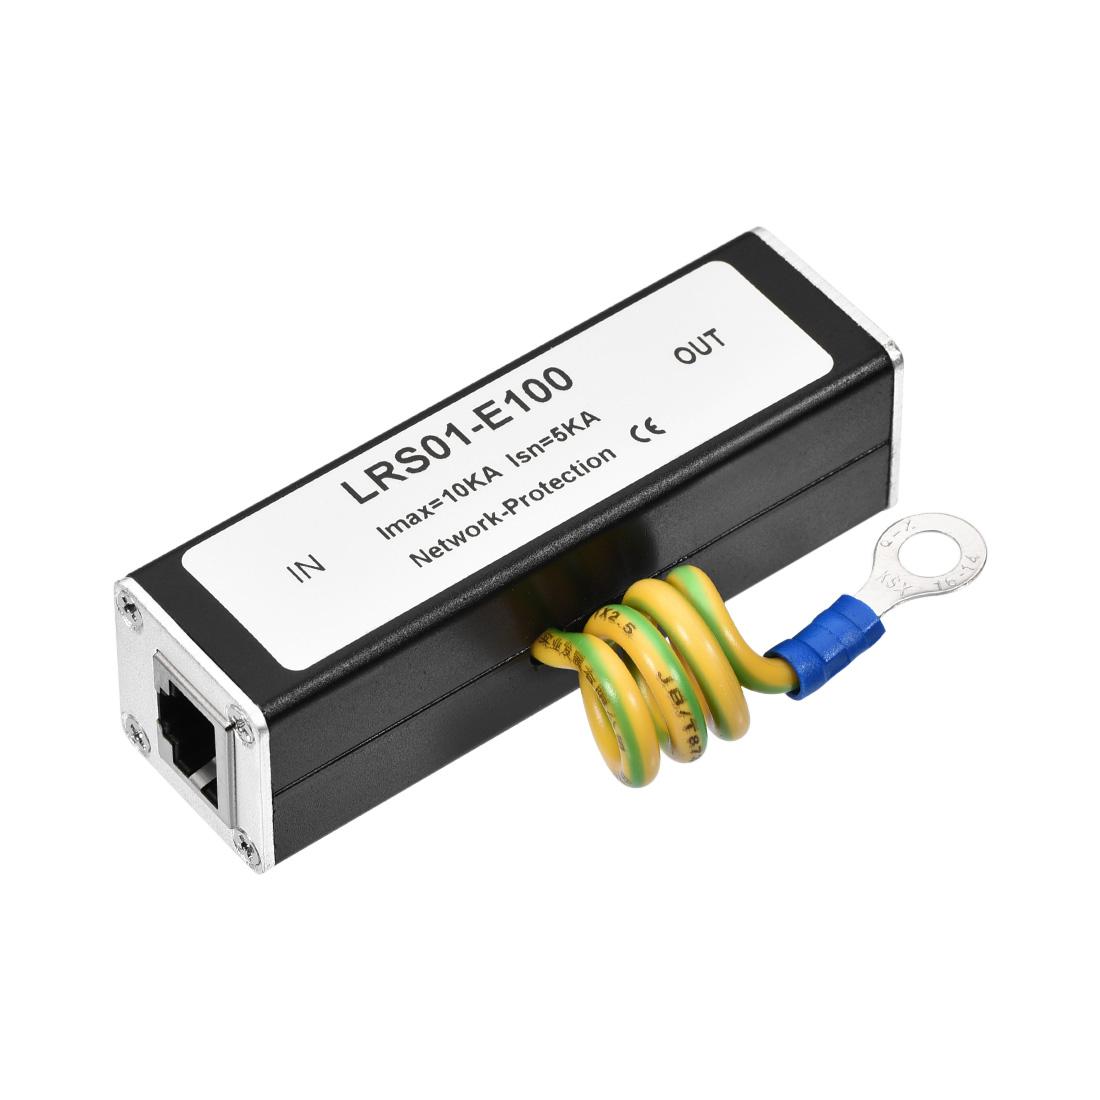 Ethernet Surge Protector for 10/100M Base-T Gigabit Modem Protection 85x25x25mm